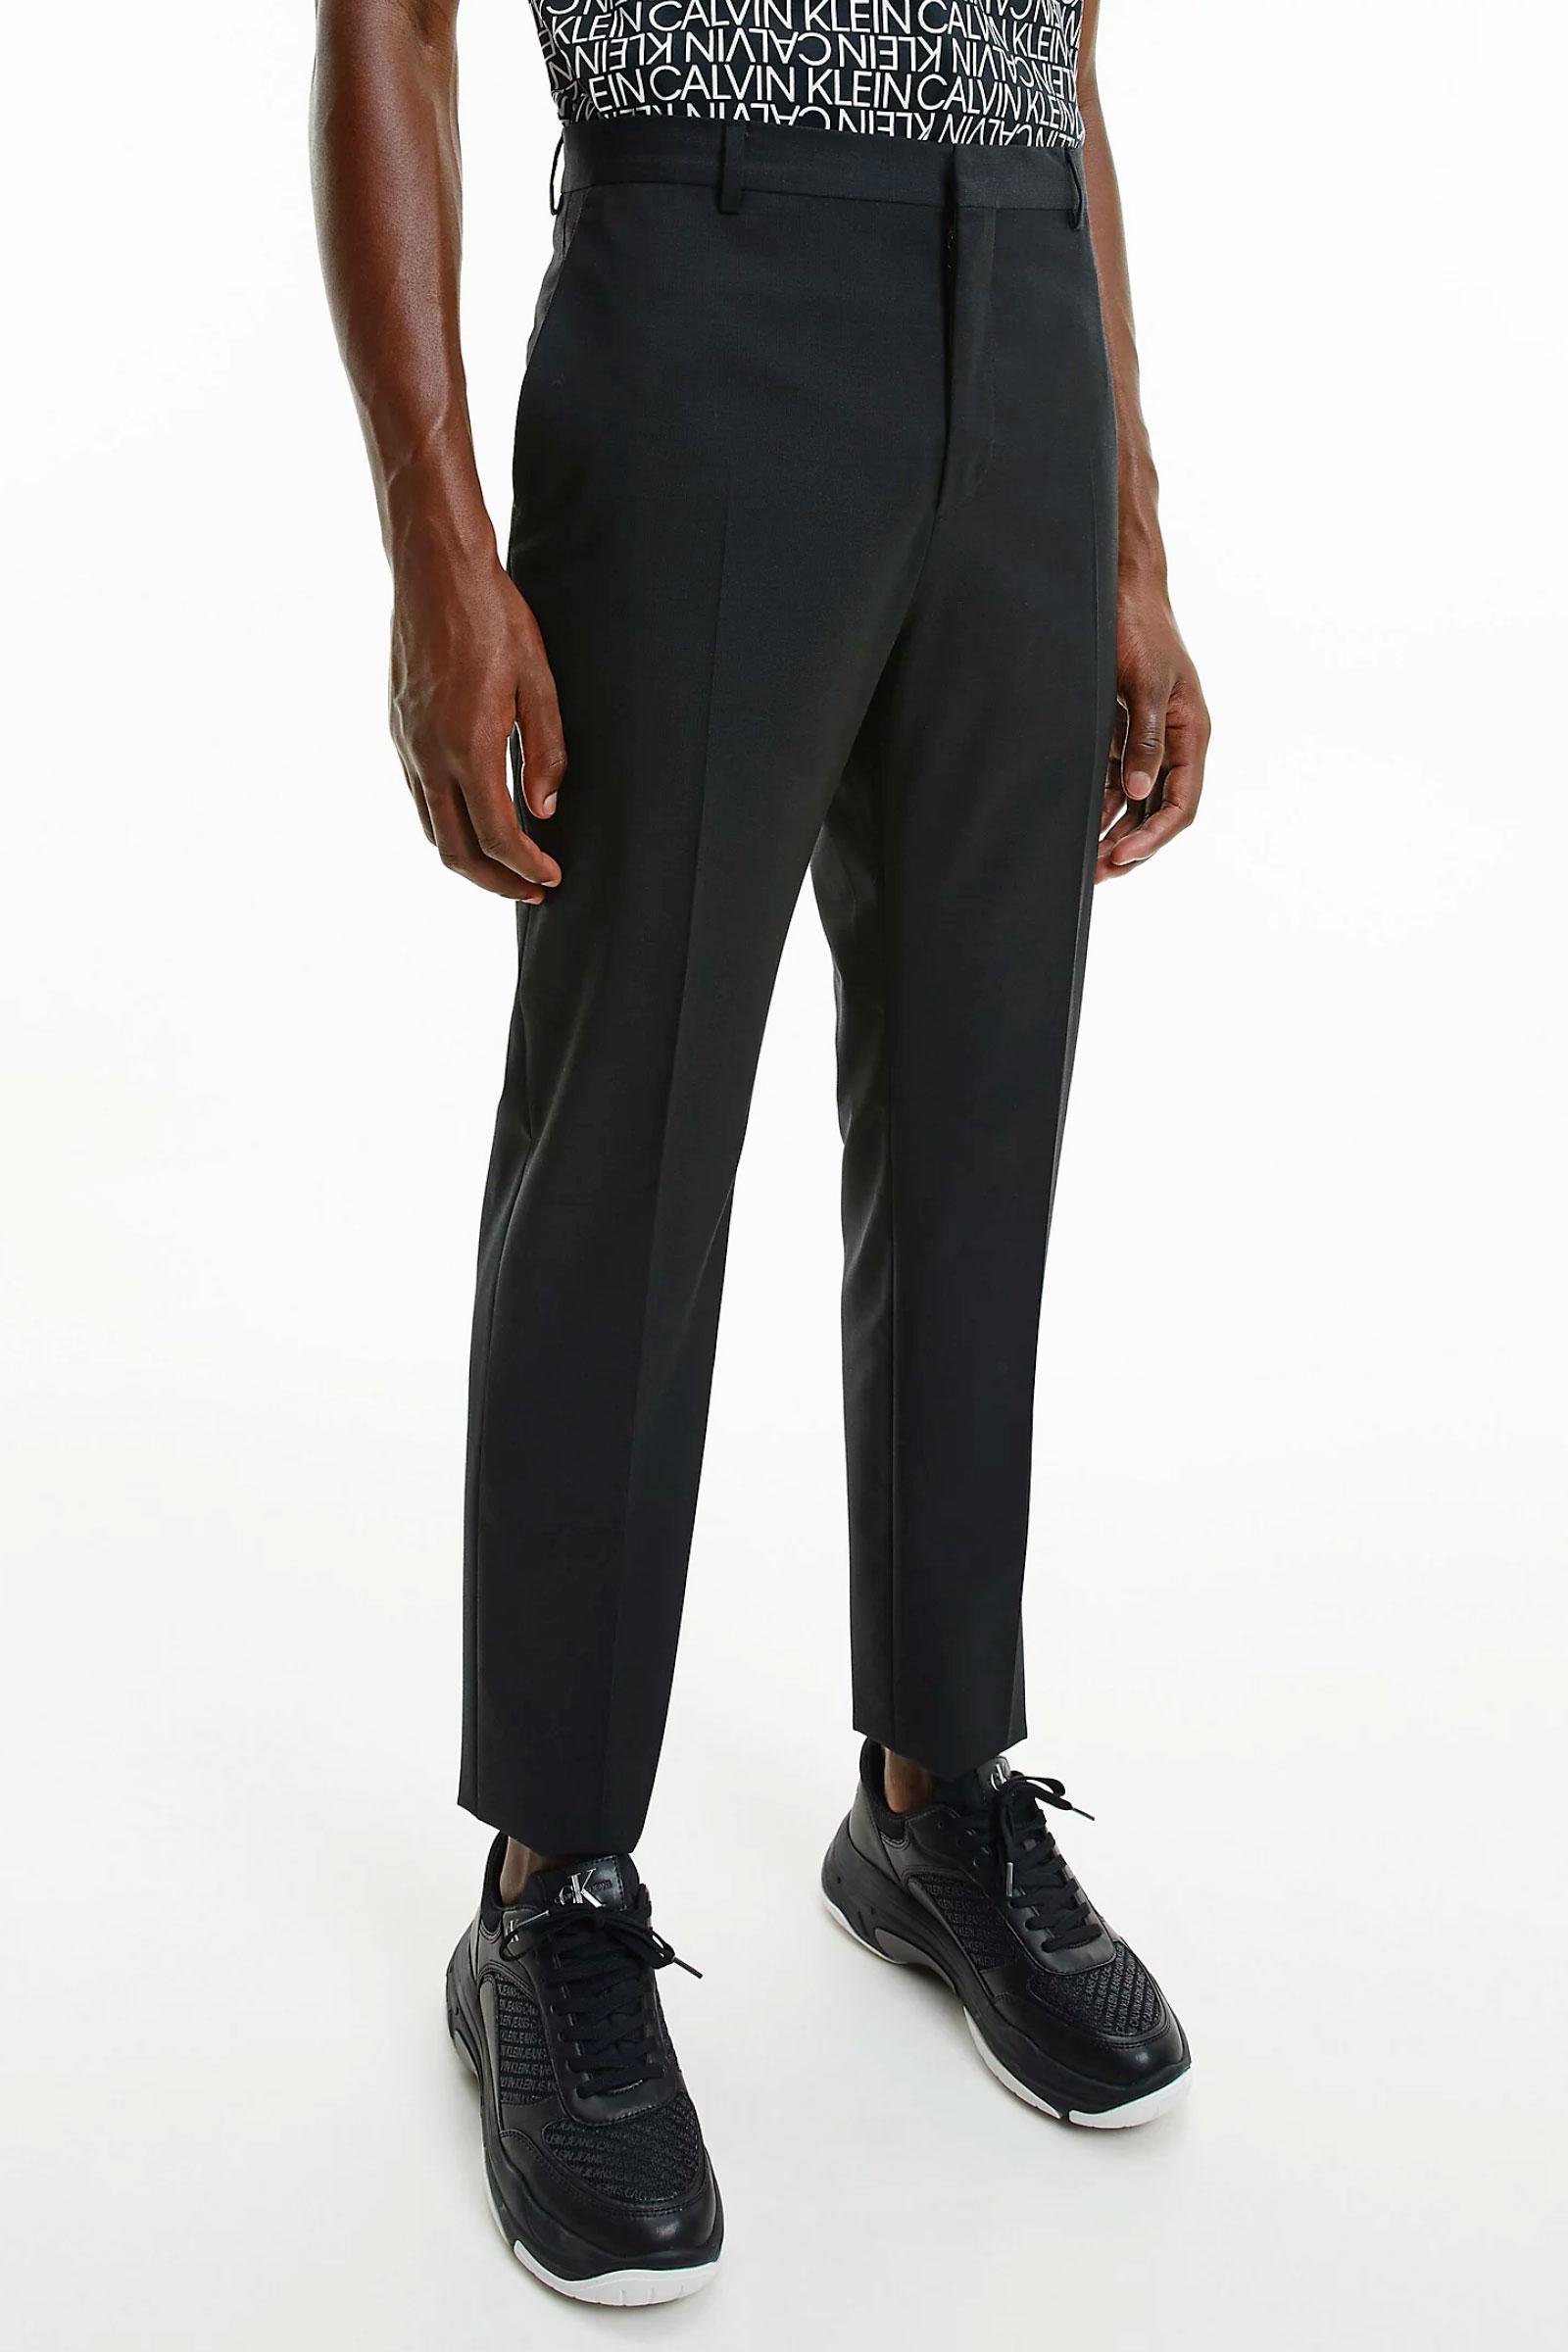 CALVIN KLEIN Men's Trousers CALVIN KLEIN   Trousers   K10K106430BEH